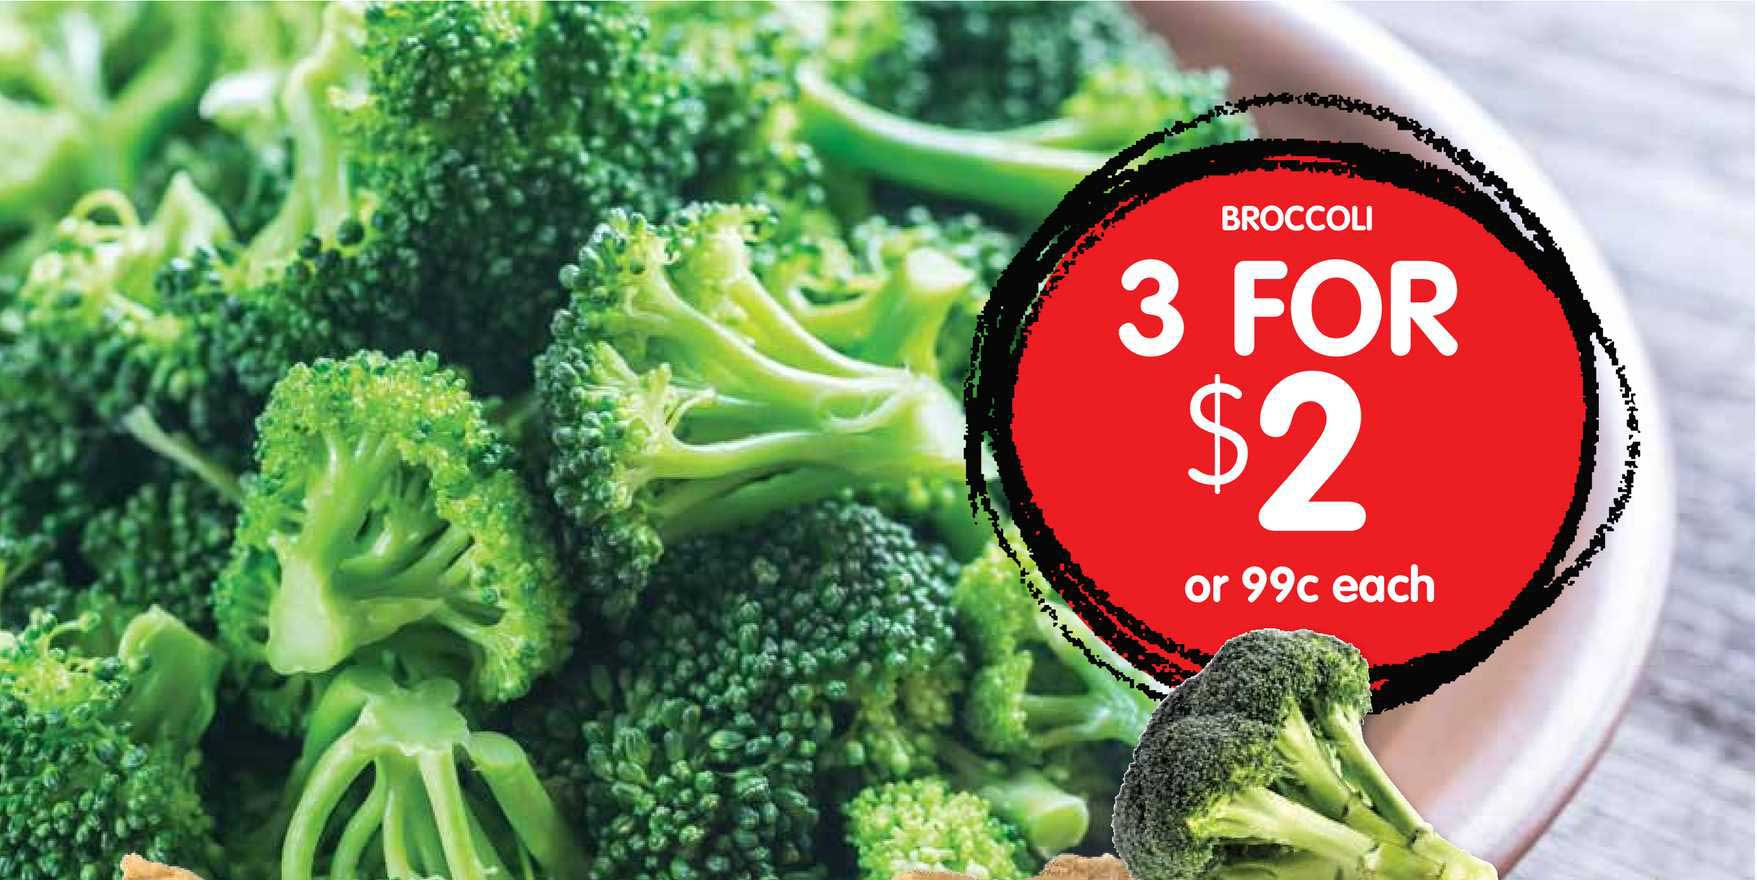 Spudshed Broccoli